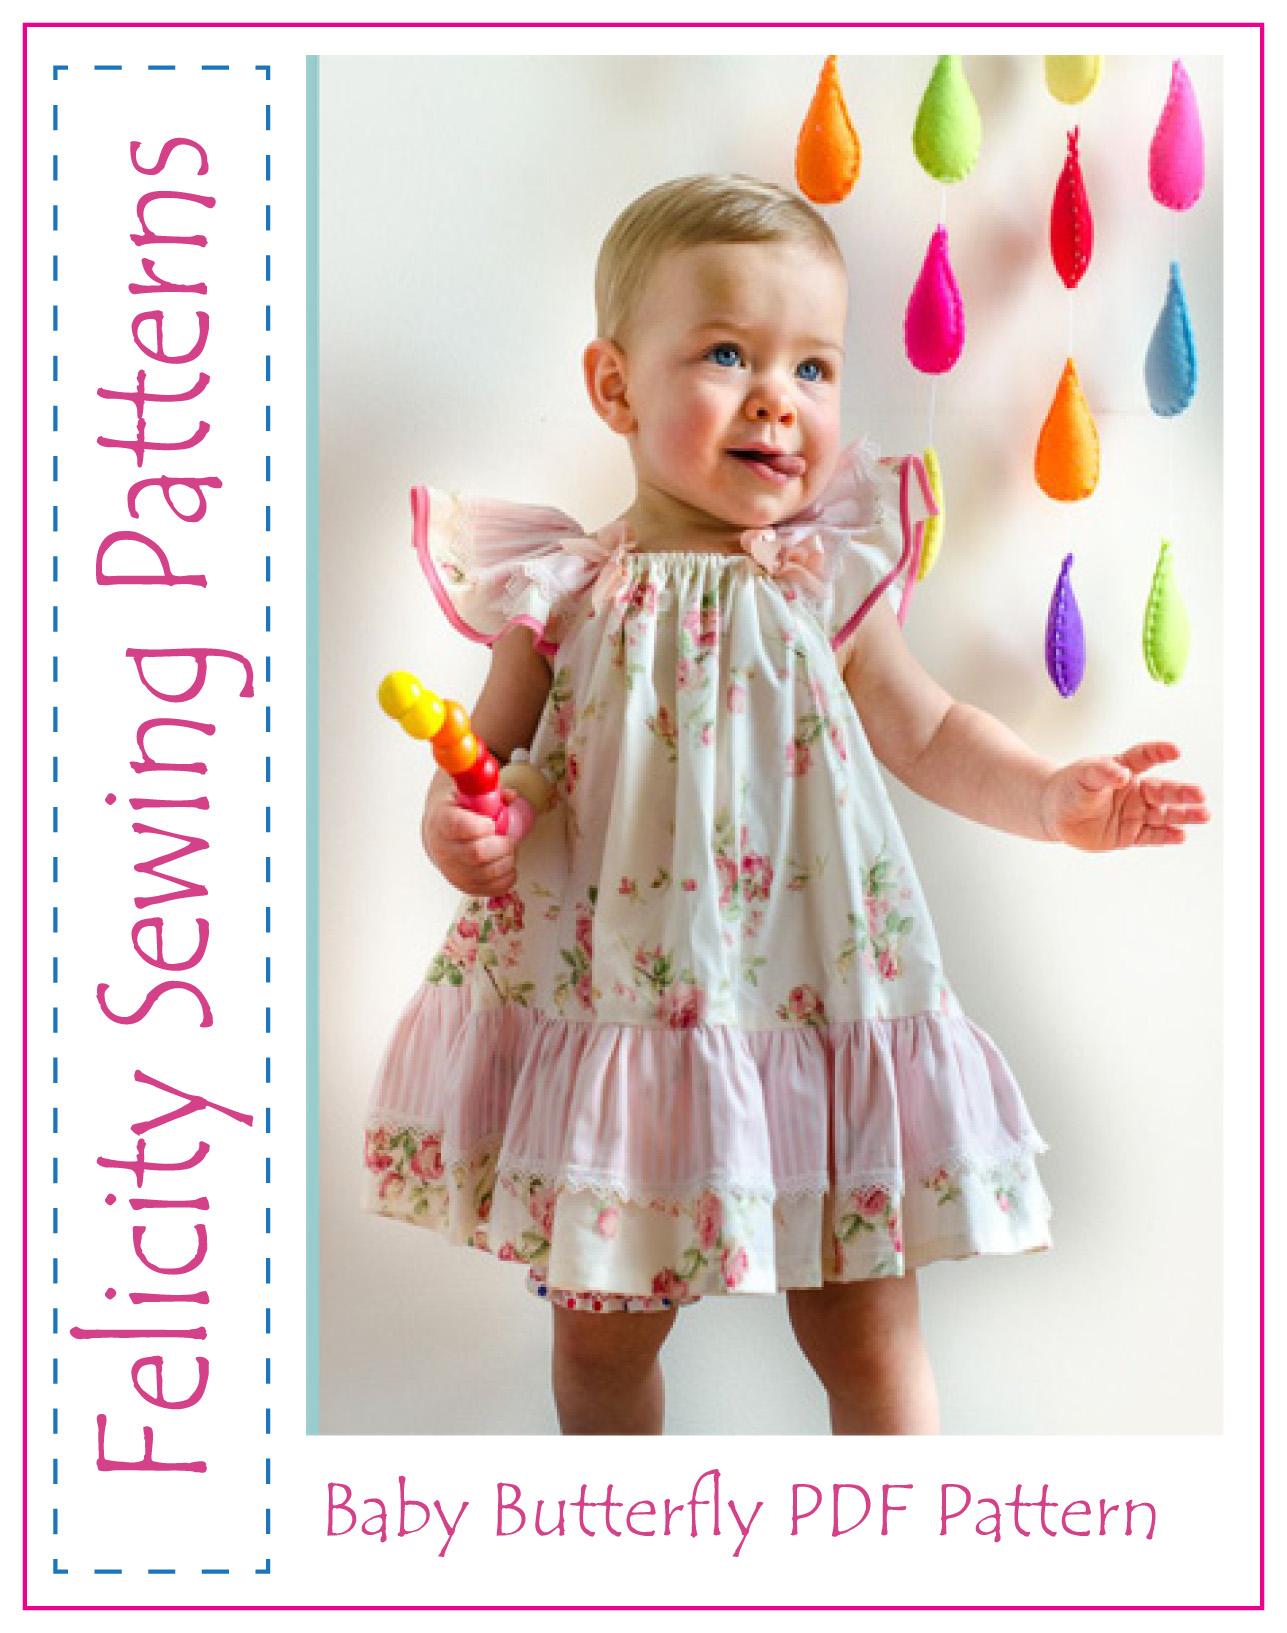 Felicity Sewing Patterns Baby Butterfly PDF Pattern.jpg